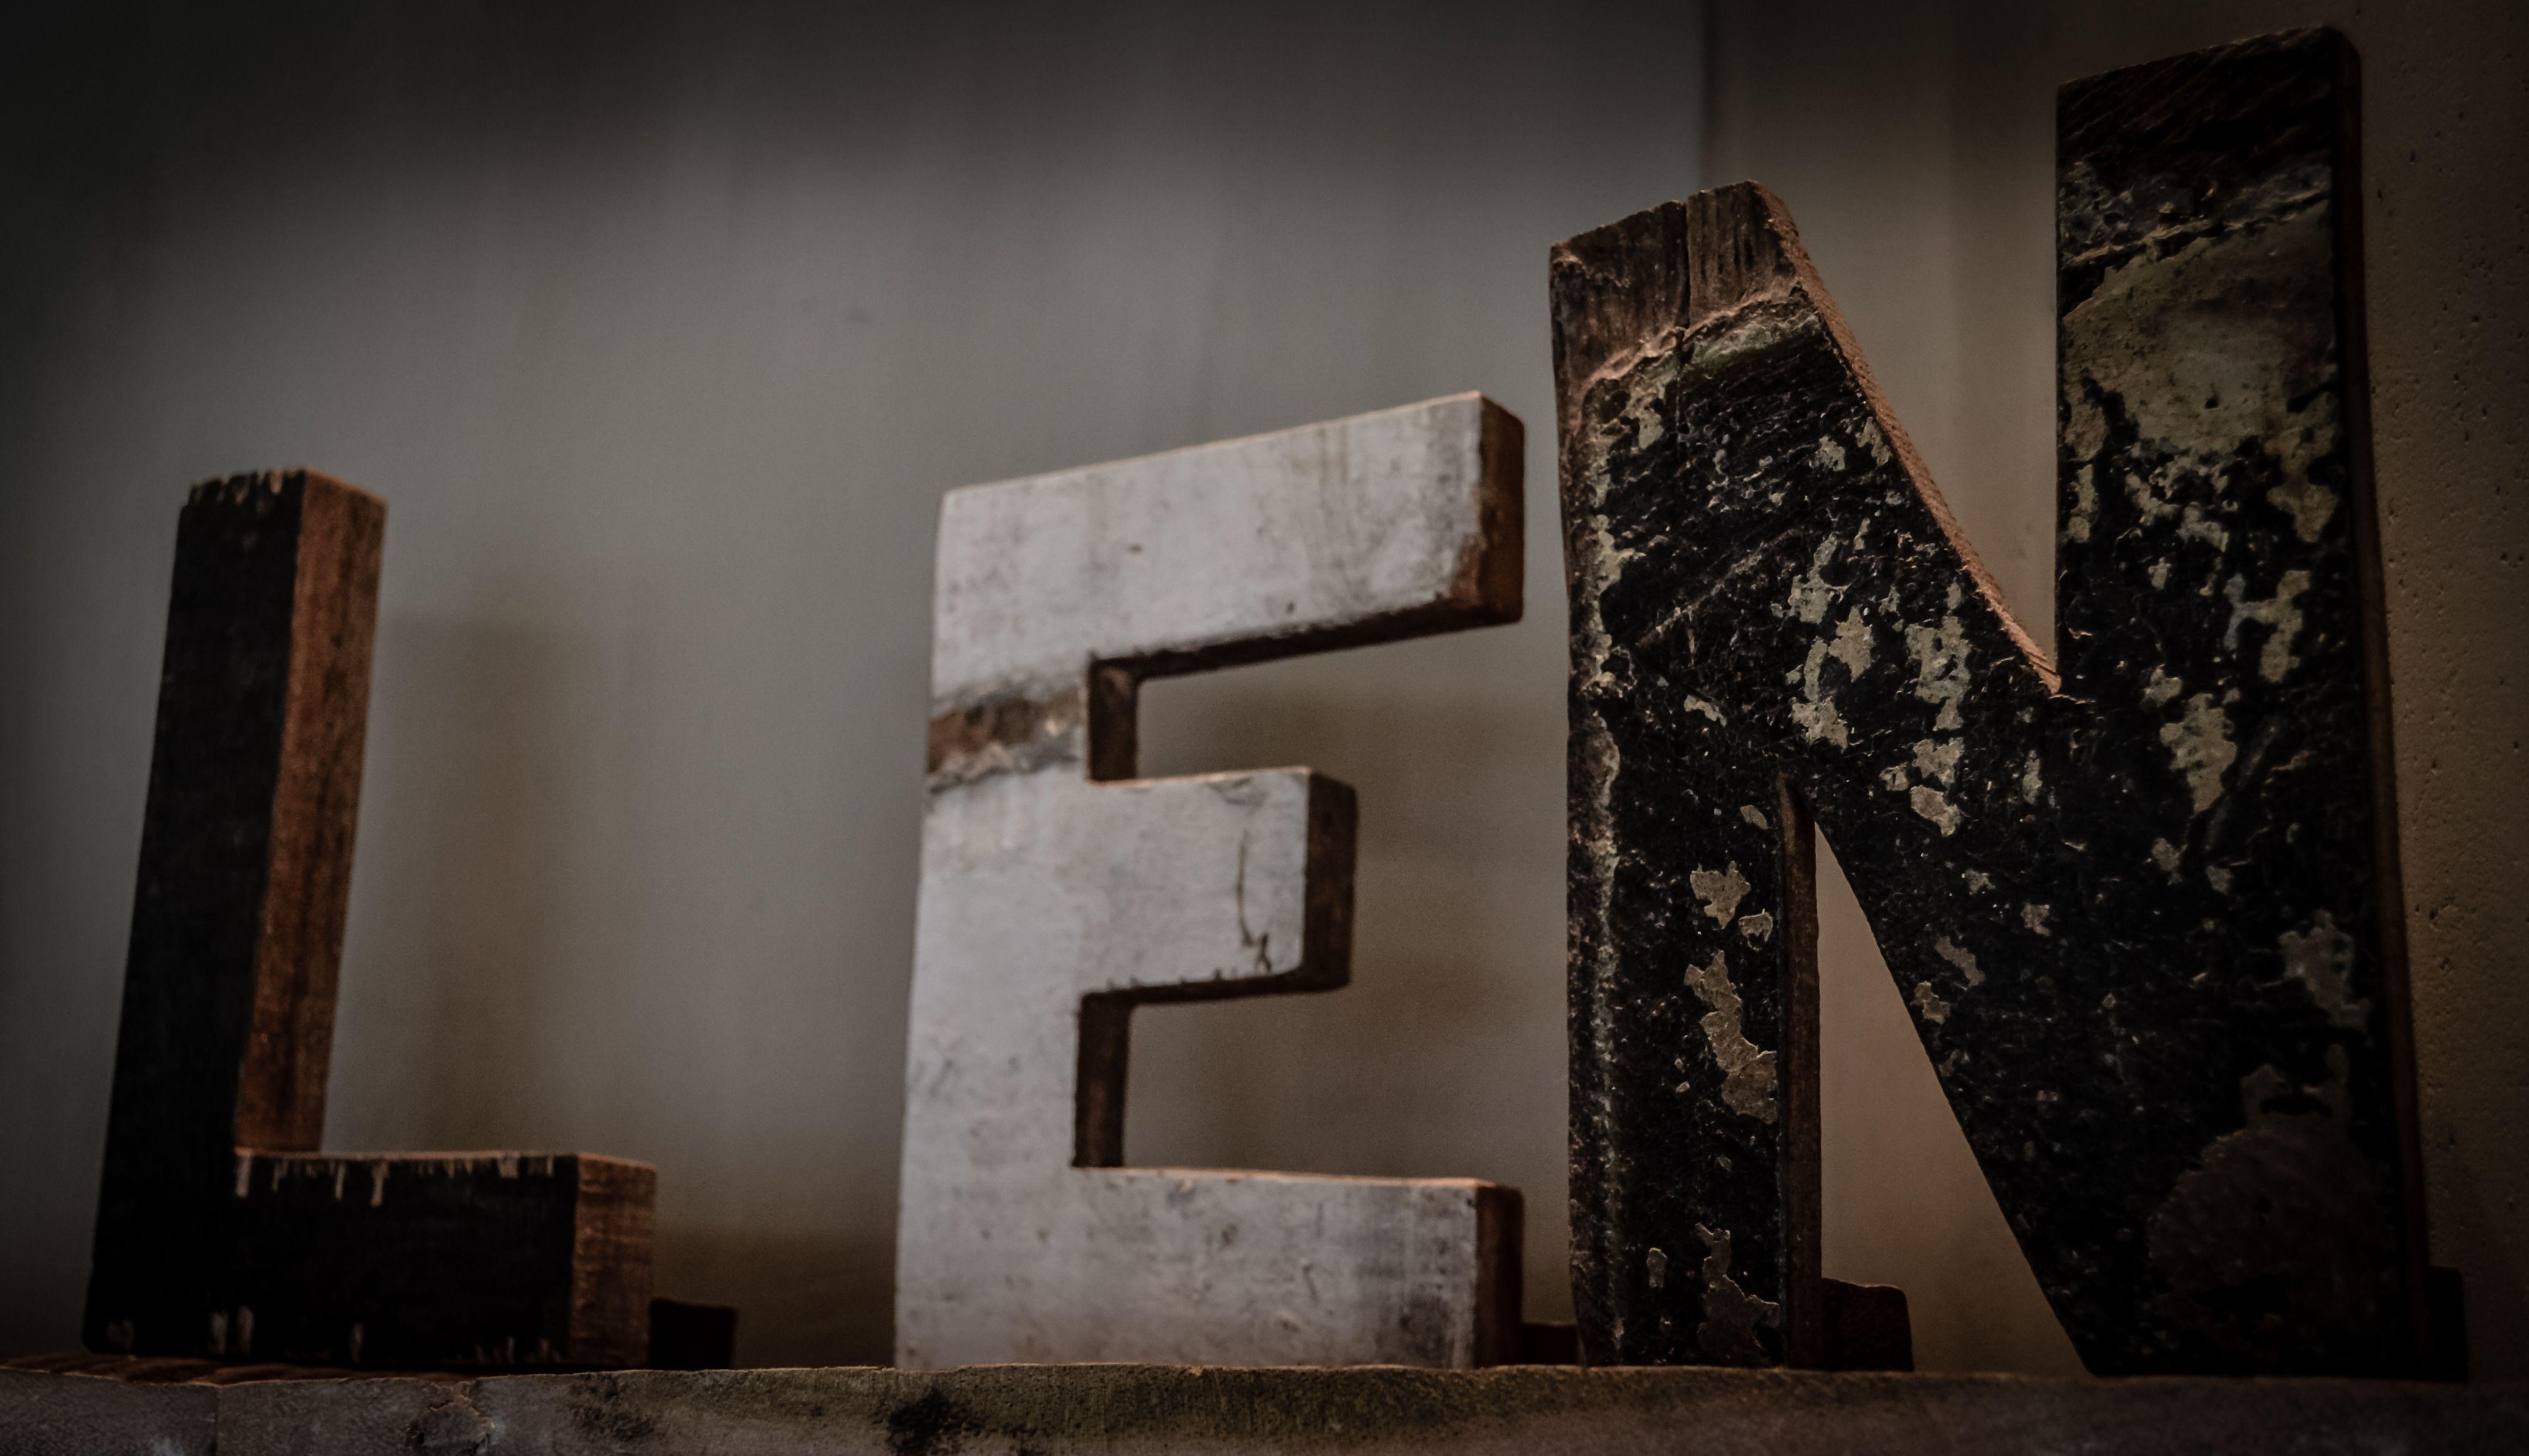 Coole Letters Babykamer : Coole letters babykamera coole letters babykamera houten letters